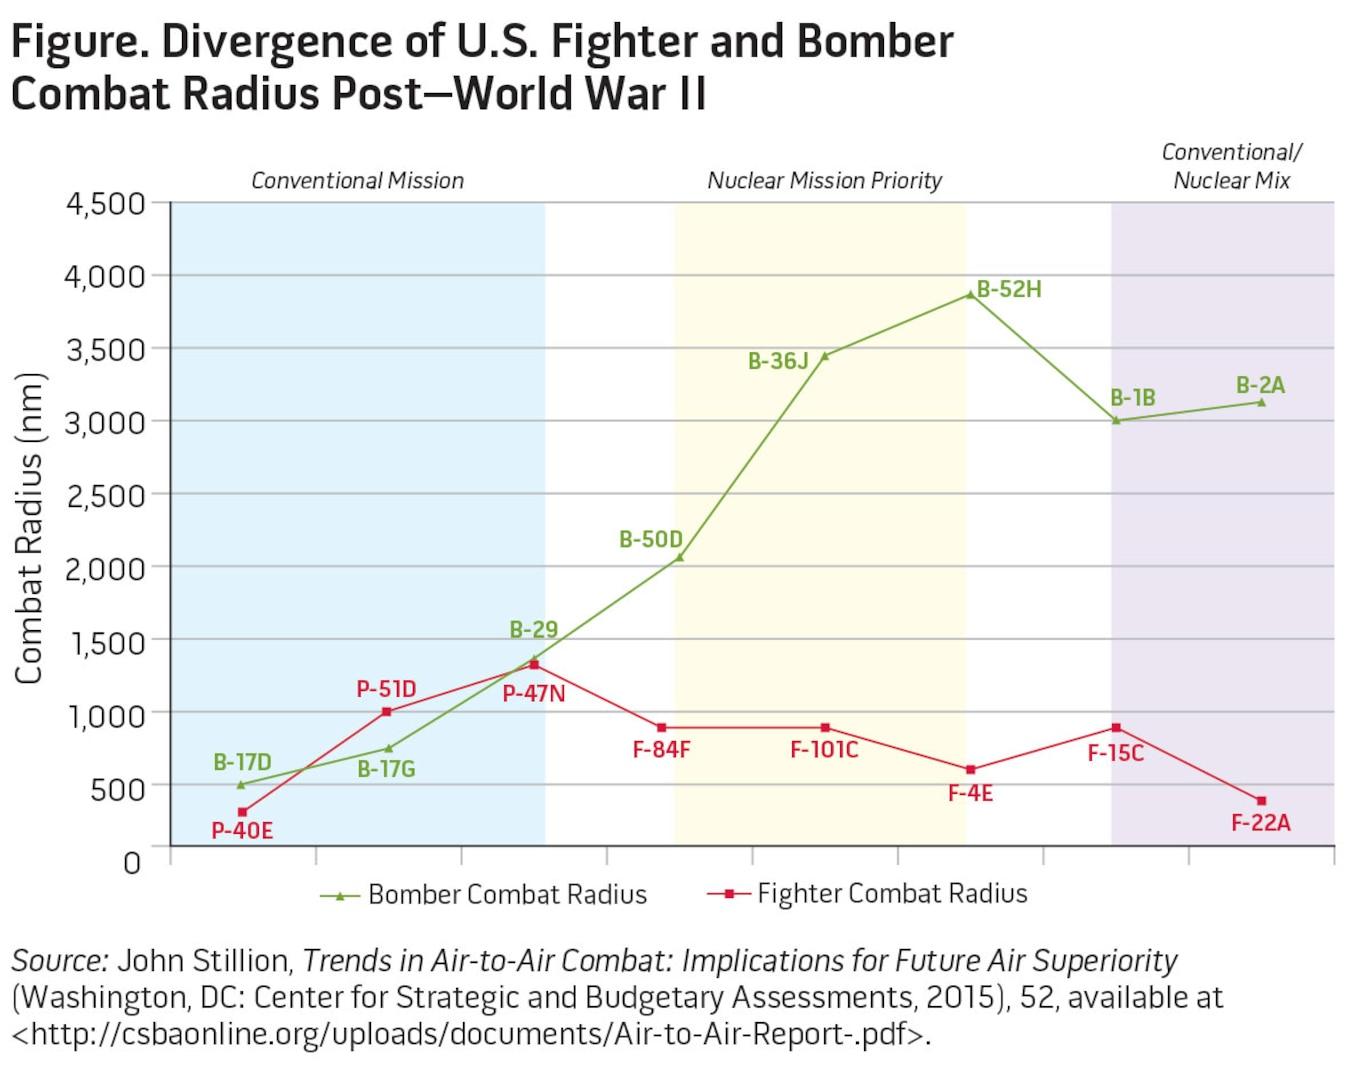 Figure. Divergence of U.S. Fighter and Bomber Combat Radius Post–World War II